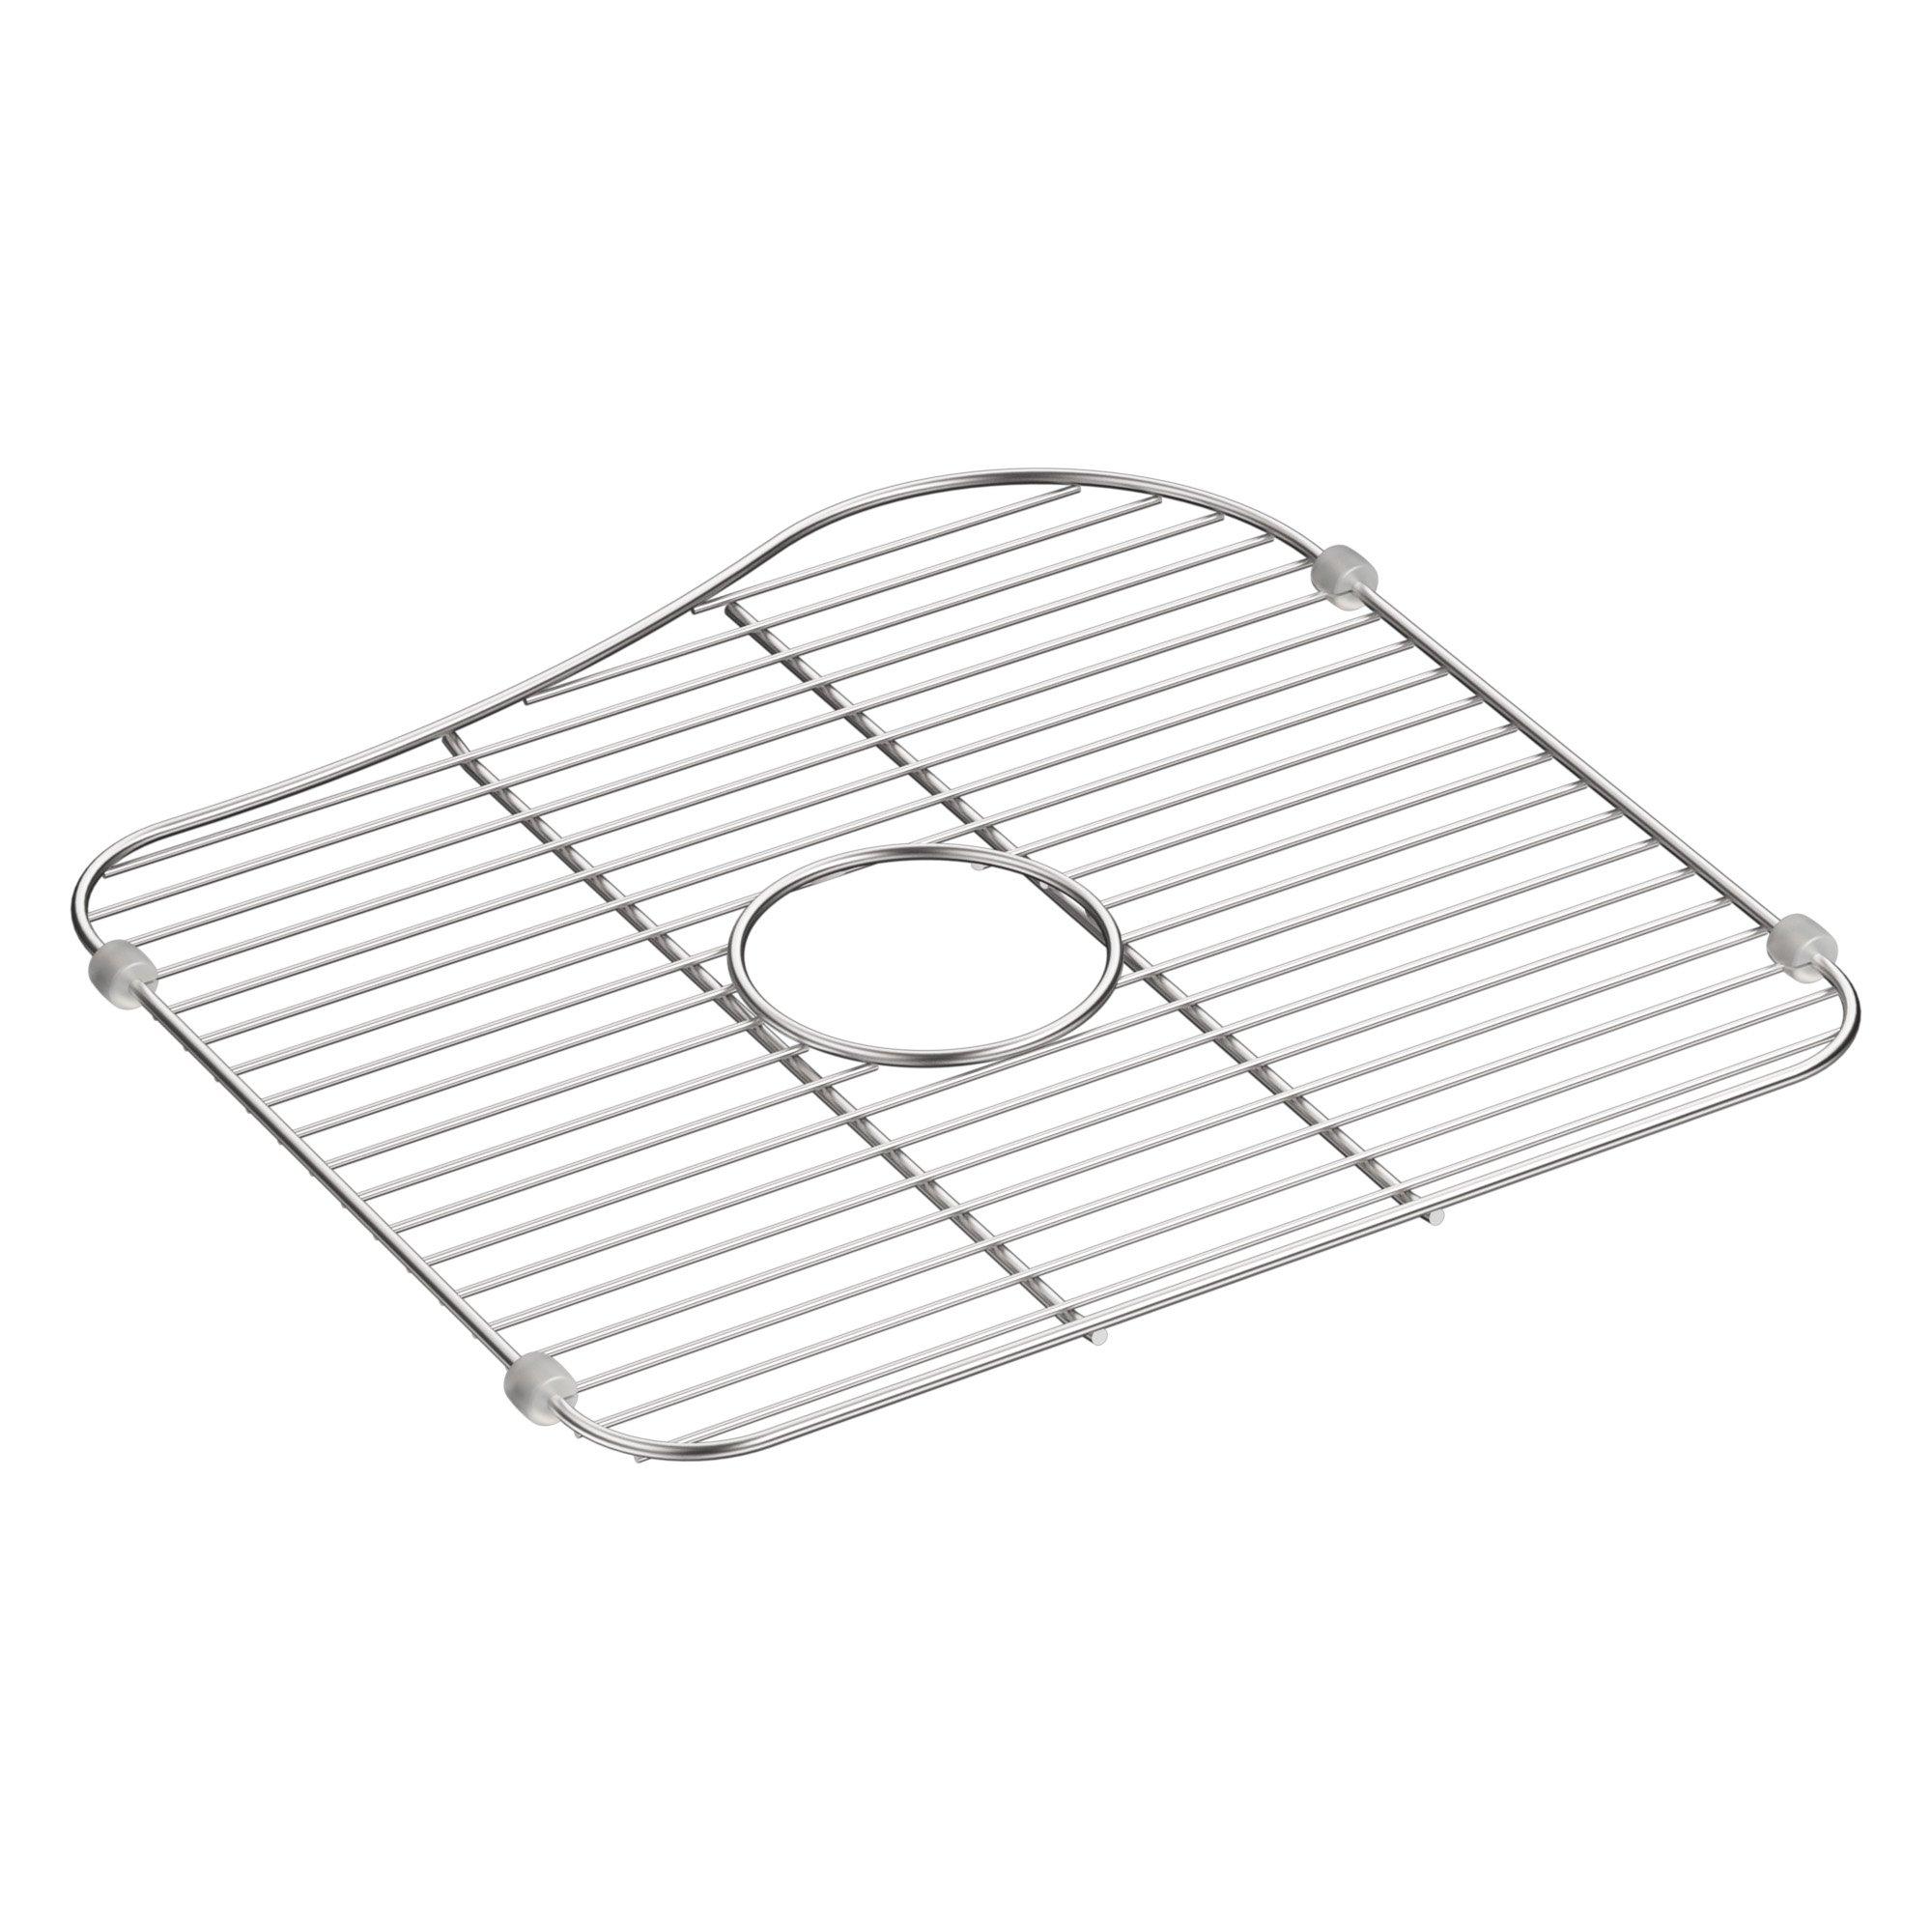 KOHLER K-5103-ST Staccato 16-5/8 x 15-7/8'' Large Sink Rack for K-3361-NA Kitchen Sink, Stainless Steel